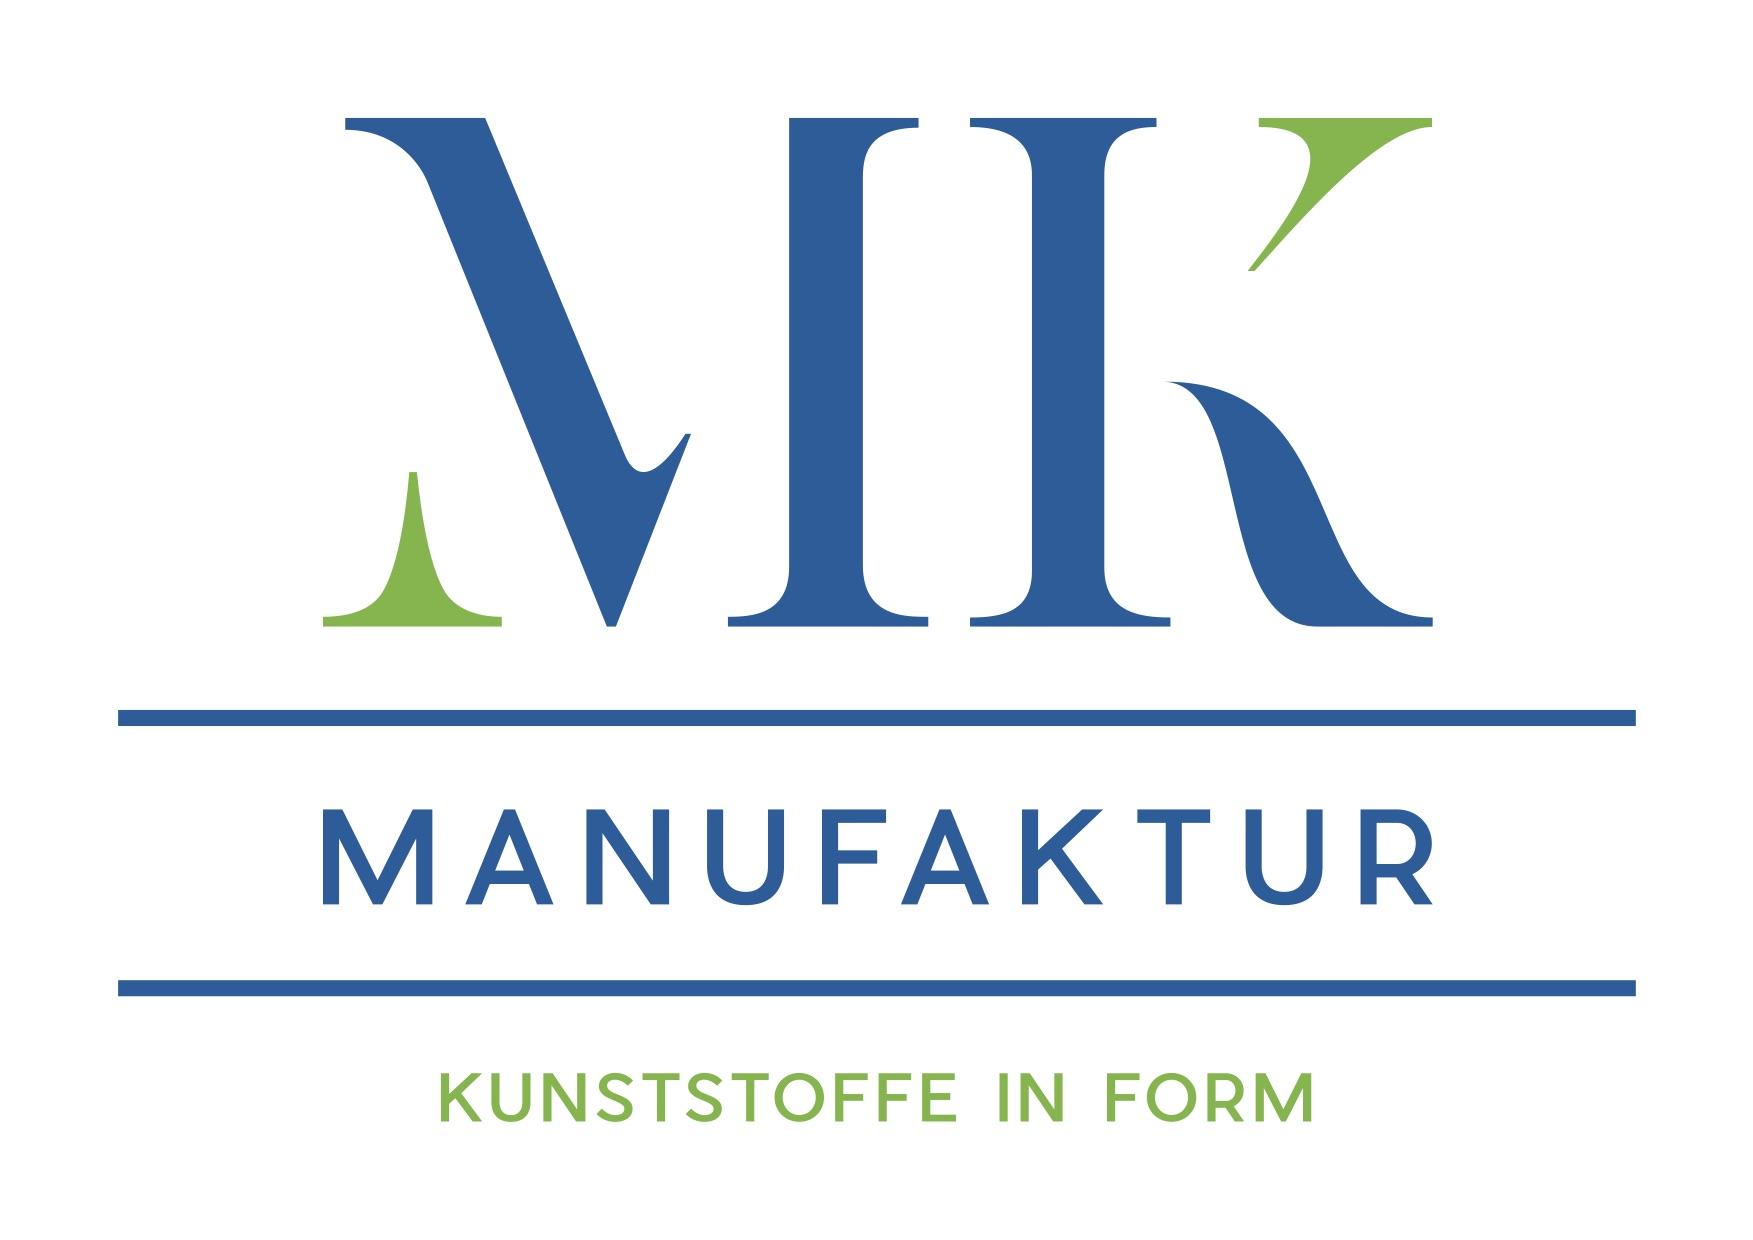 201809_mk_manufaktur_logos_positiv_fg-1